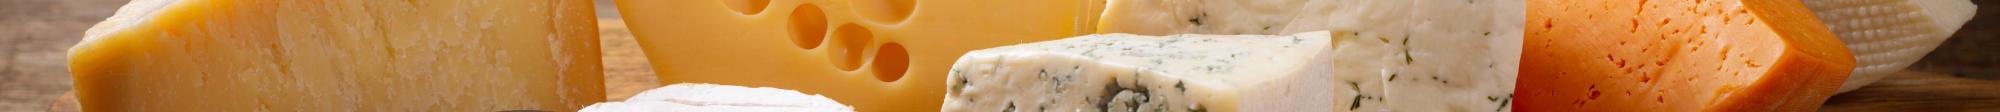 Comprar queso búfala online gourmet   Mixtura Gourmet